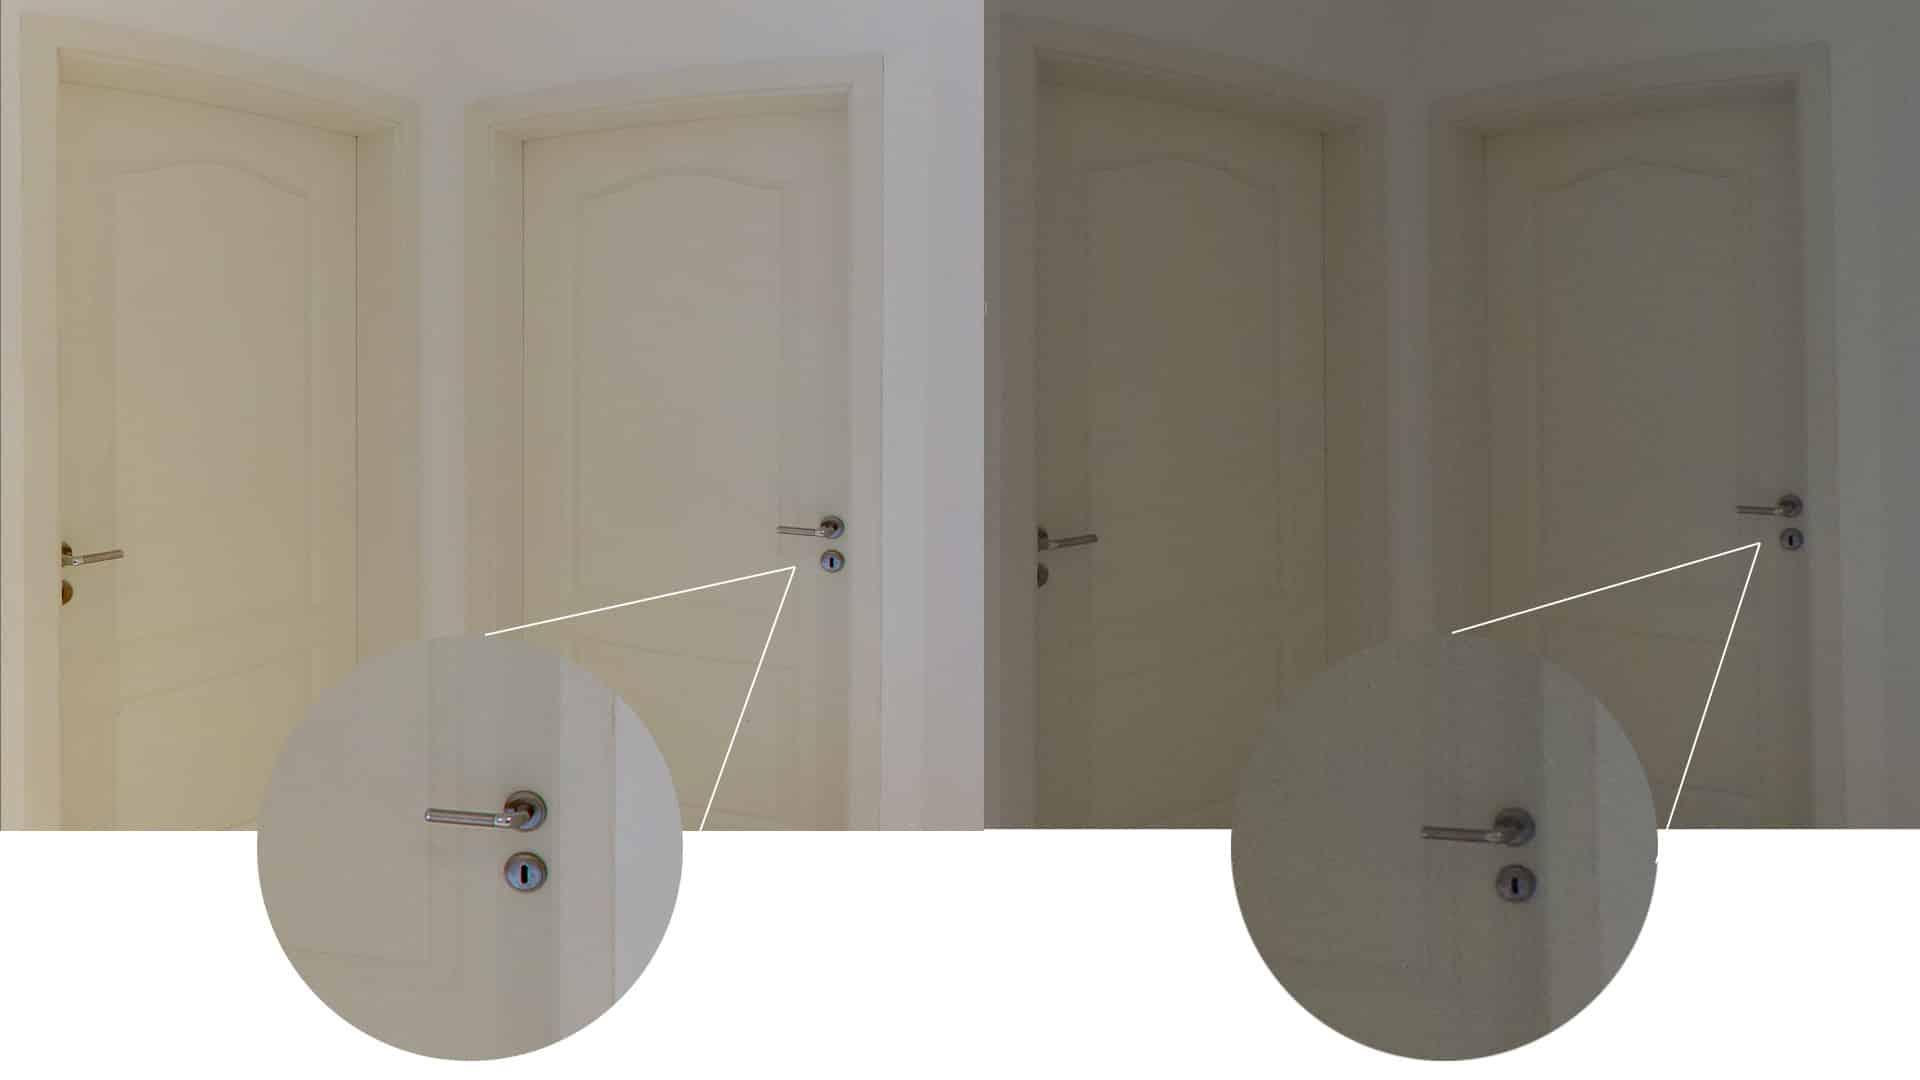 360 grad kamera bild vergleich